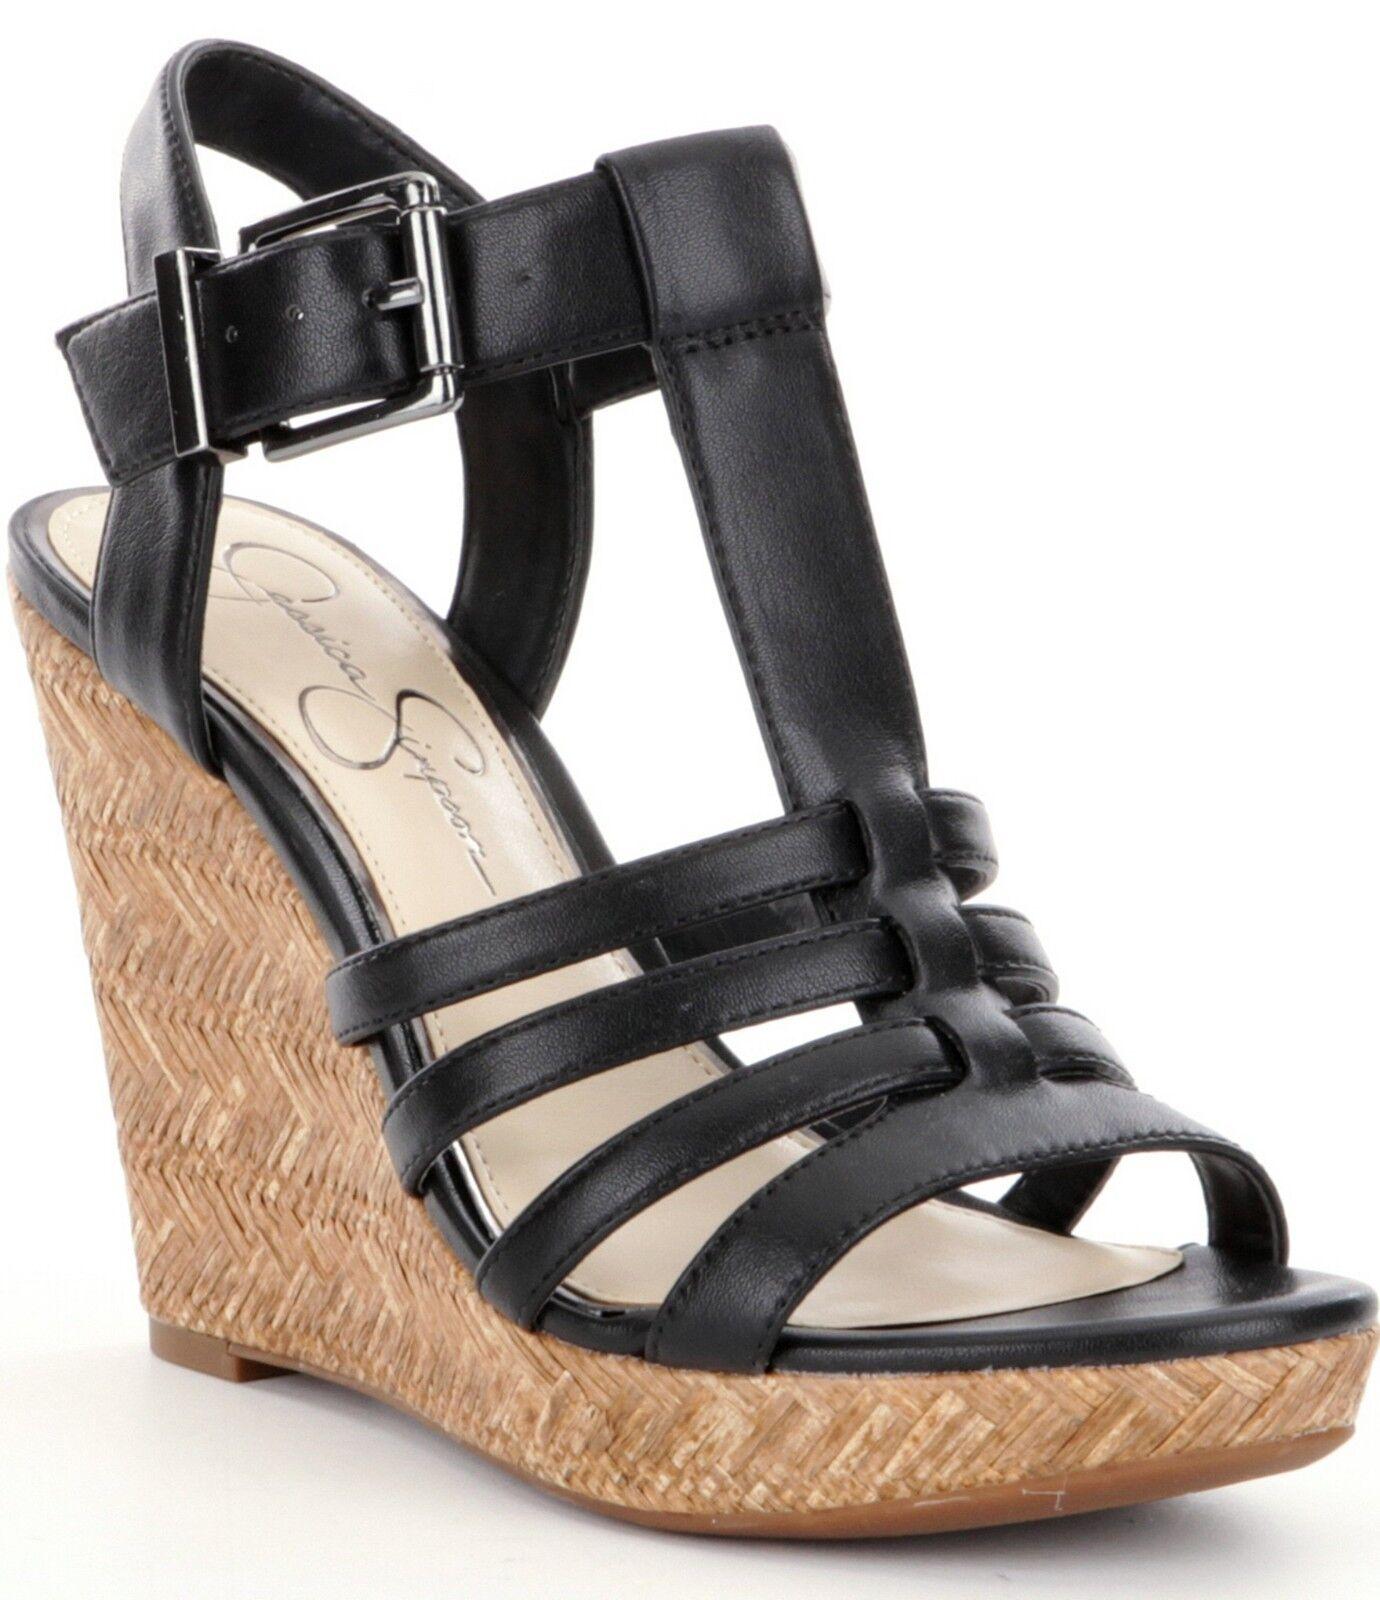 Jessica Simpson Jenaa Platform Wedge Sandals, Sizes 6-10 Black Black Black Sleek JS-JENNA 29c575